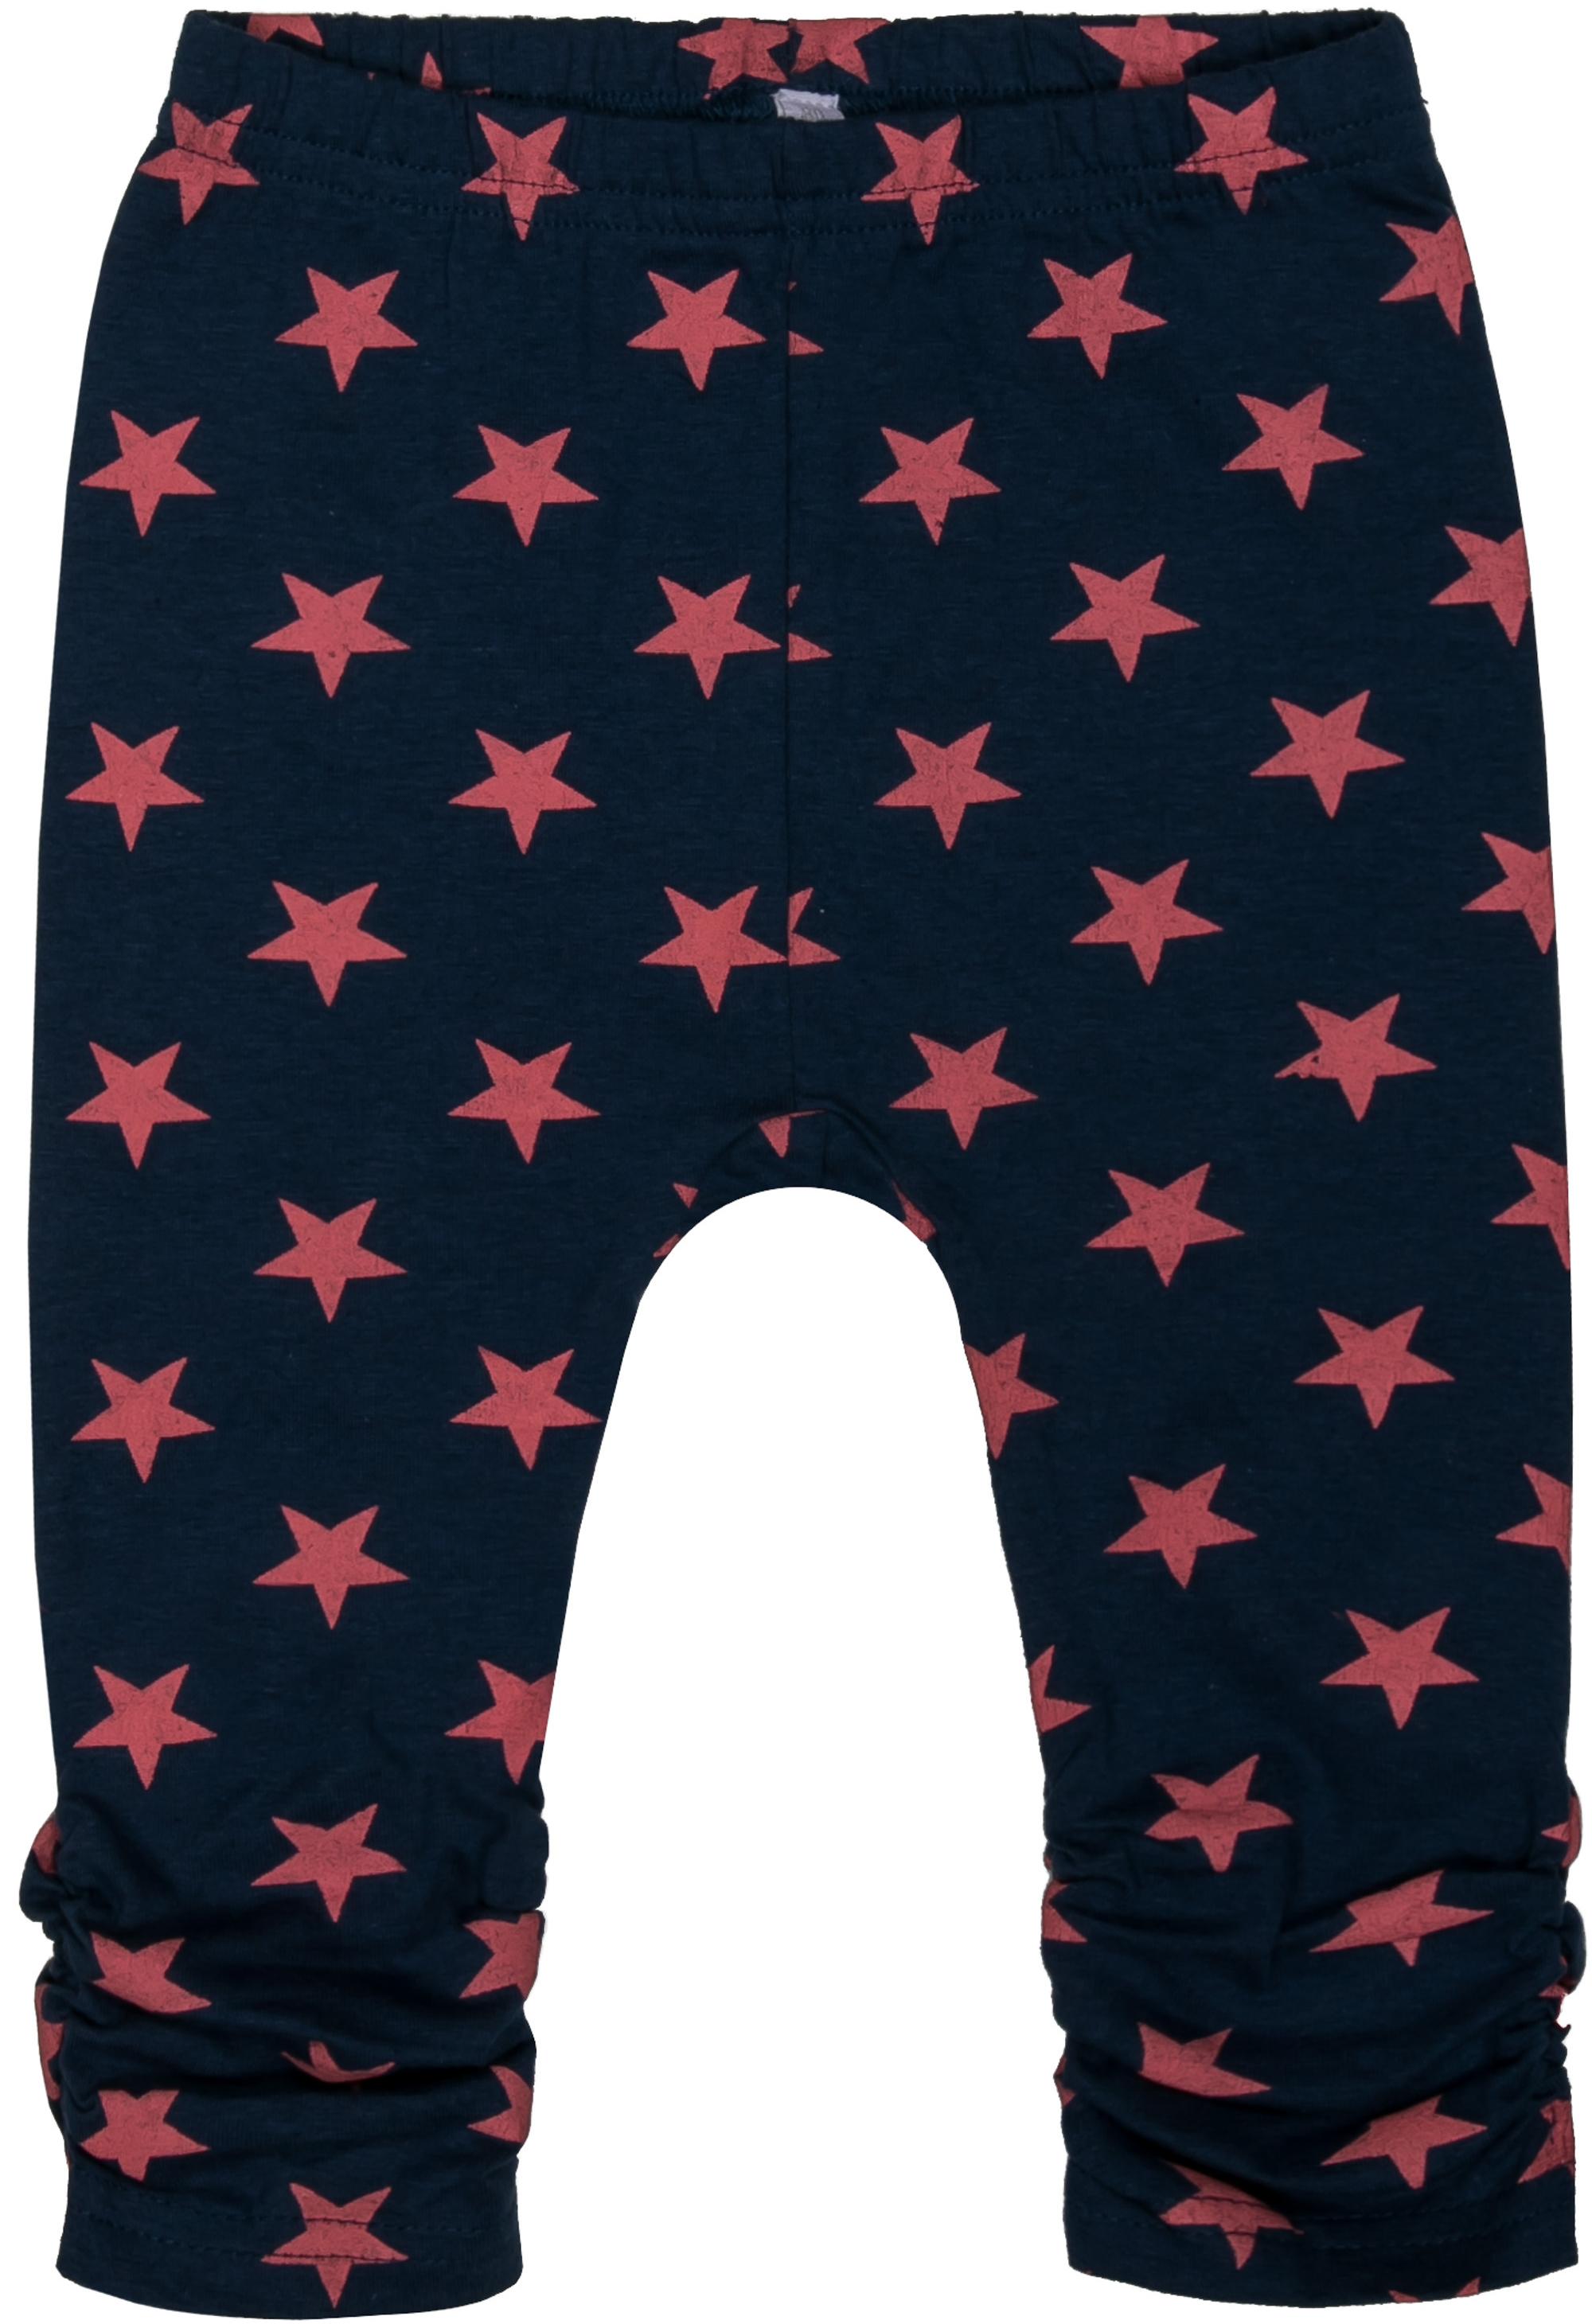 Легинсы Barkito 35Y-27617KOR брюки barkito брюки трикотажные для мальчика barkito супер baby серые с рисунком